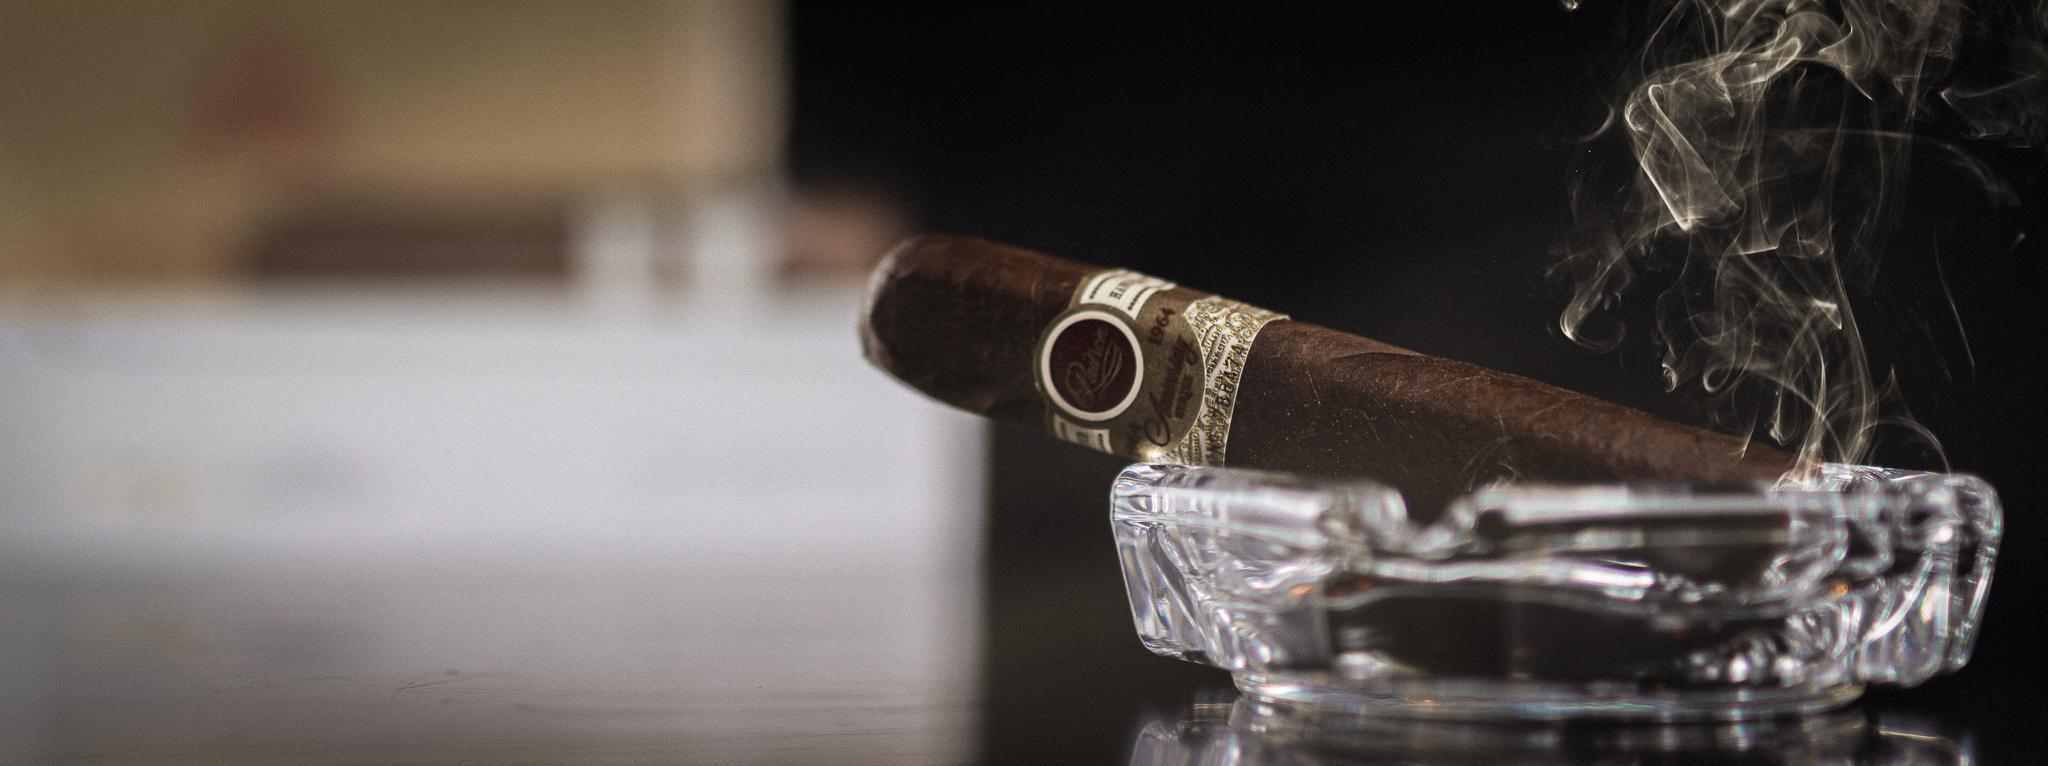 Studio photography of a cigar